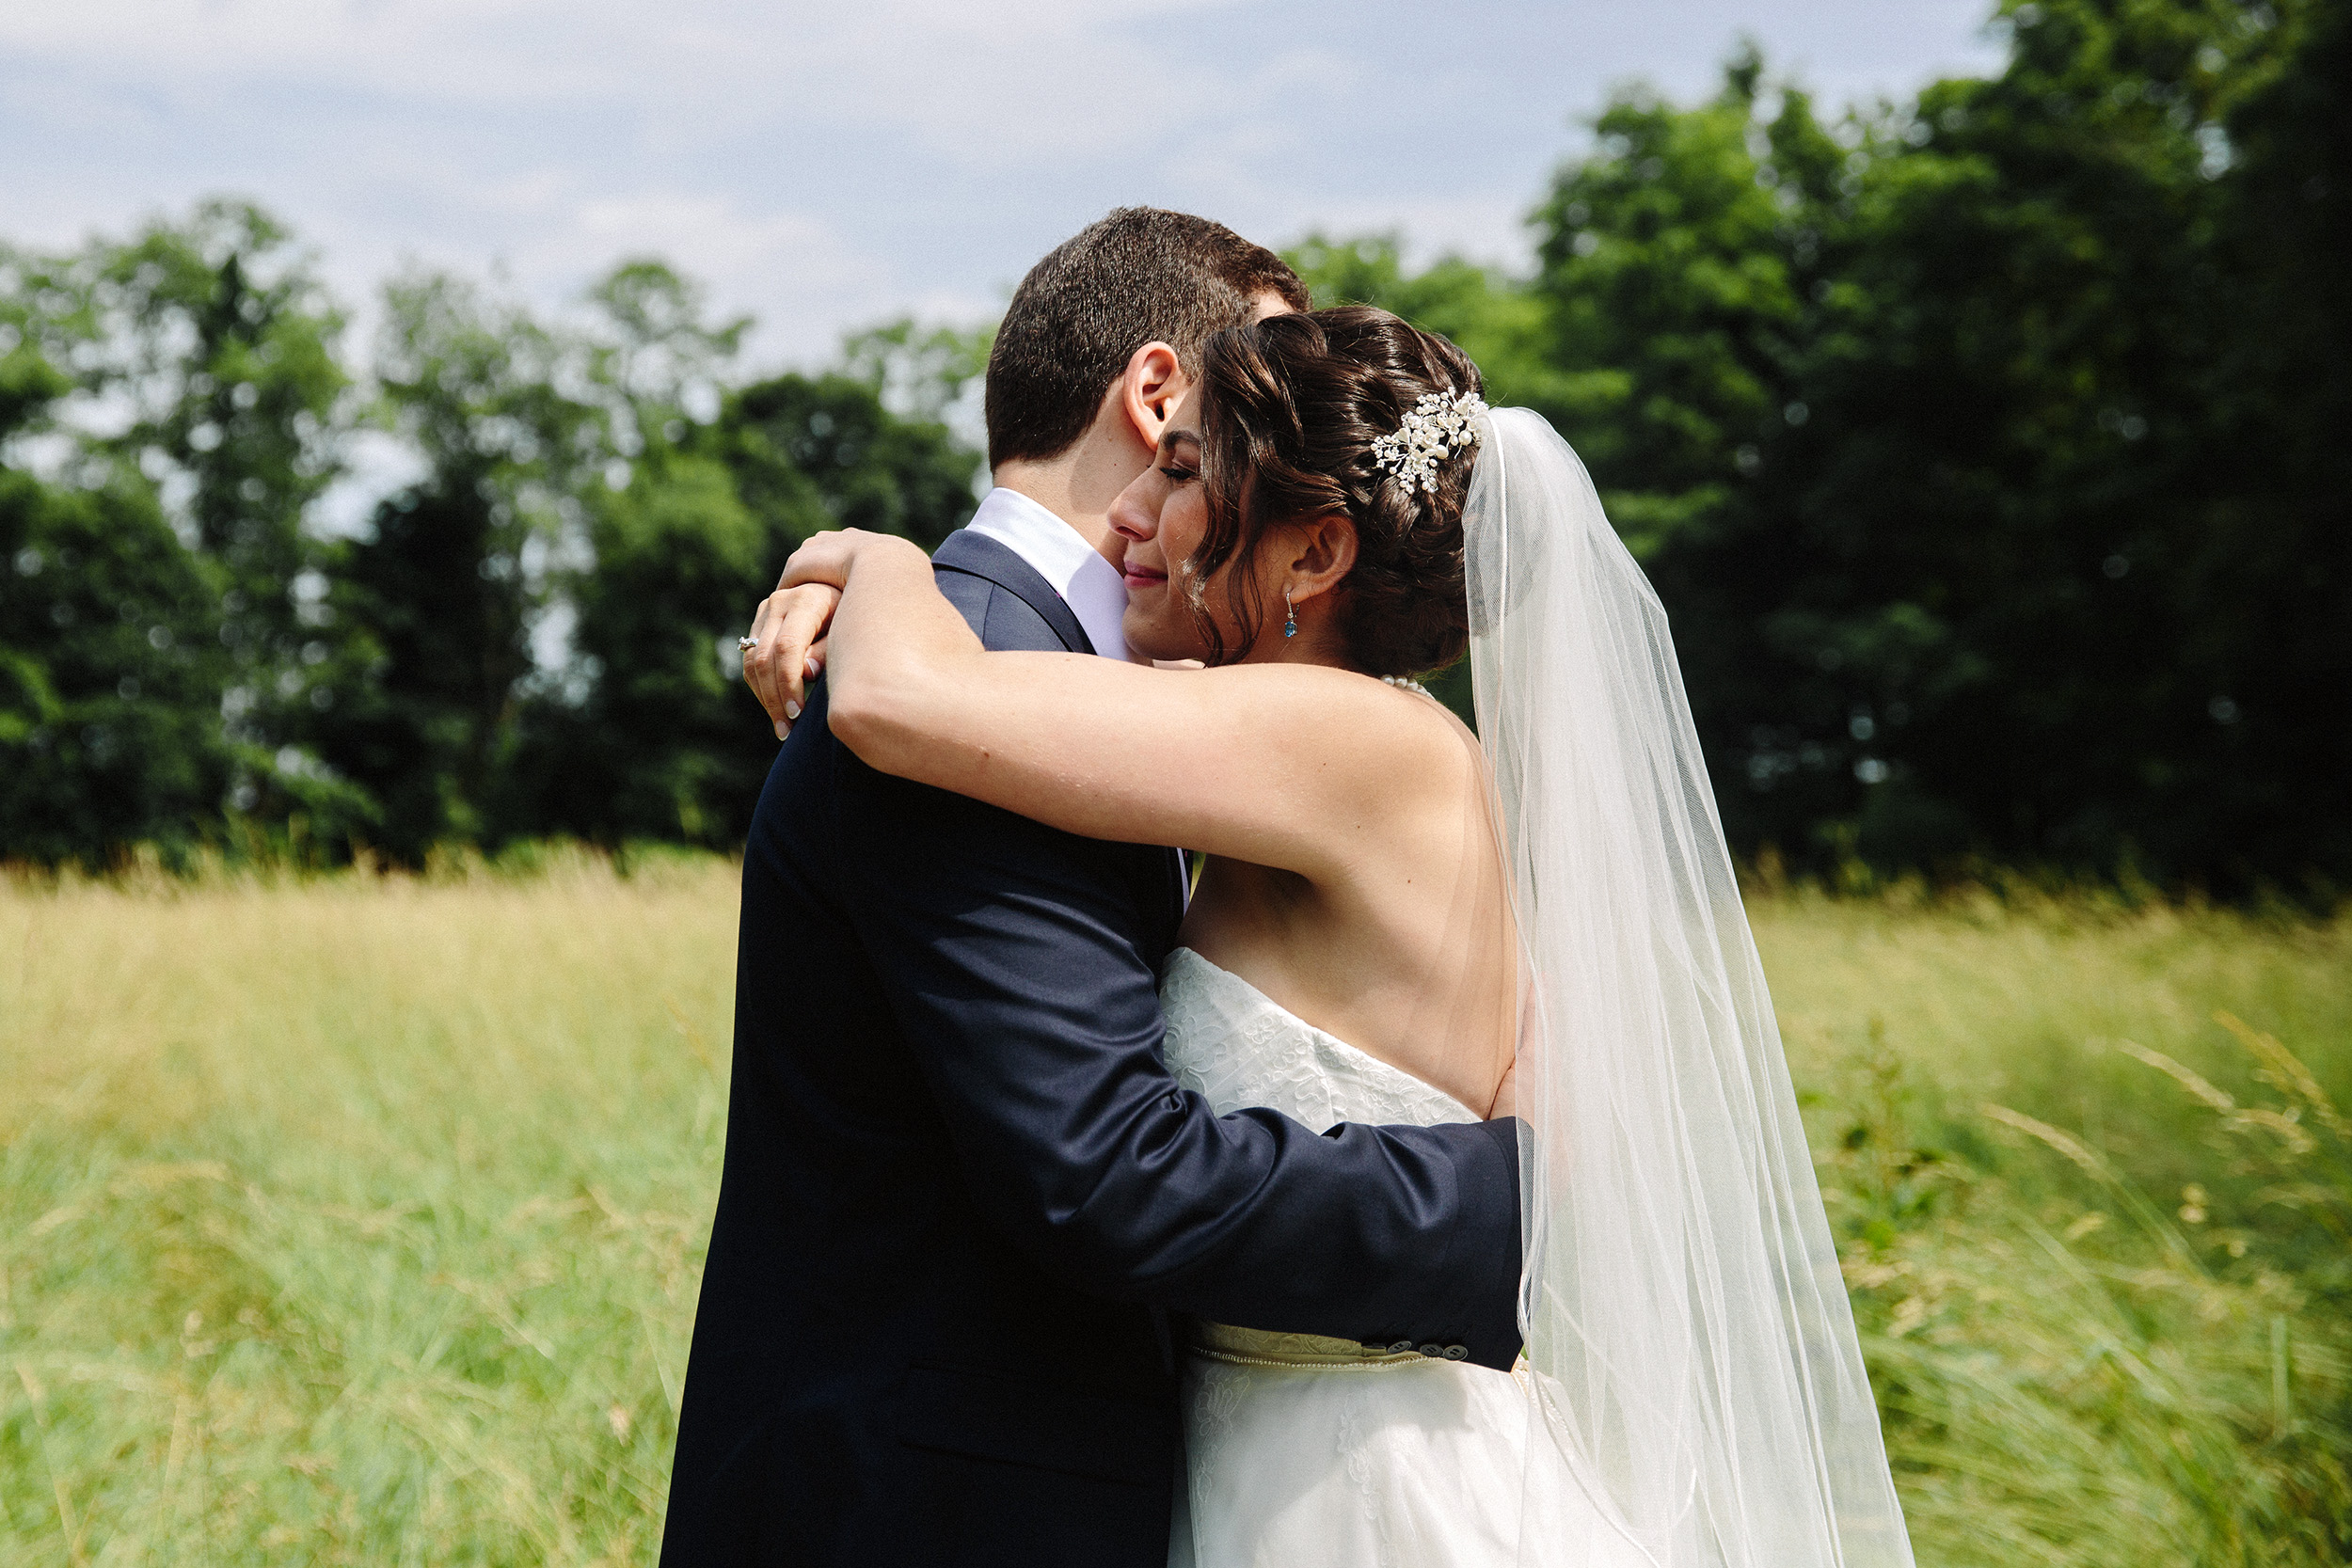 KarliCadel-Wedding-RachelJohn-0831.jpg